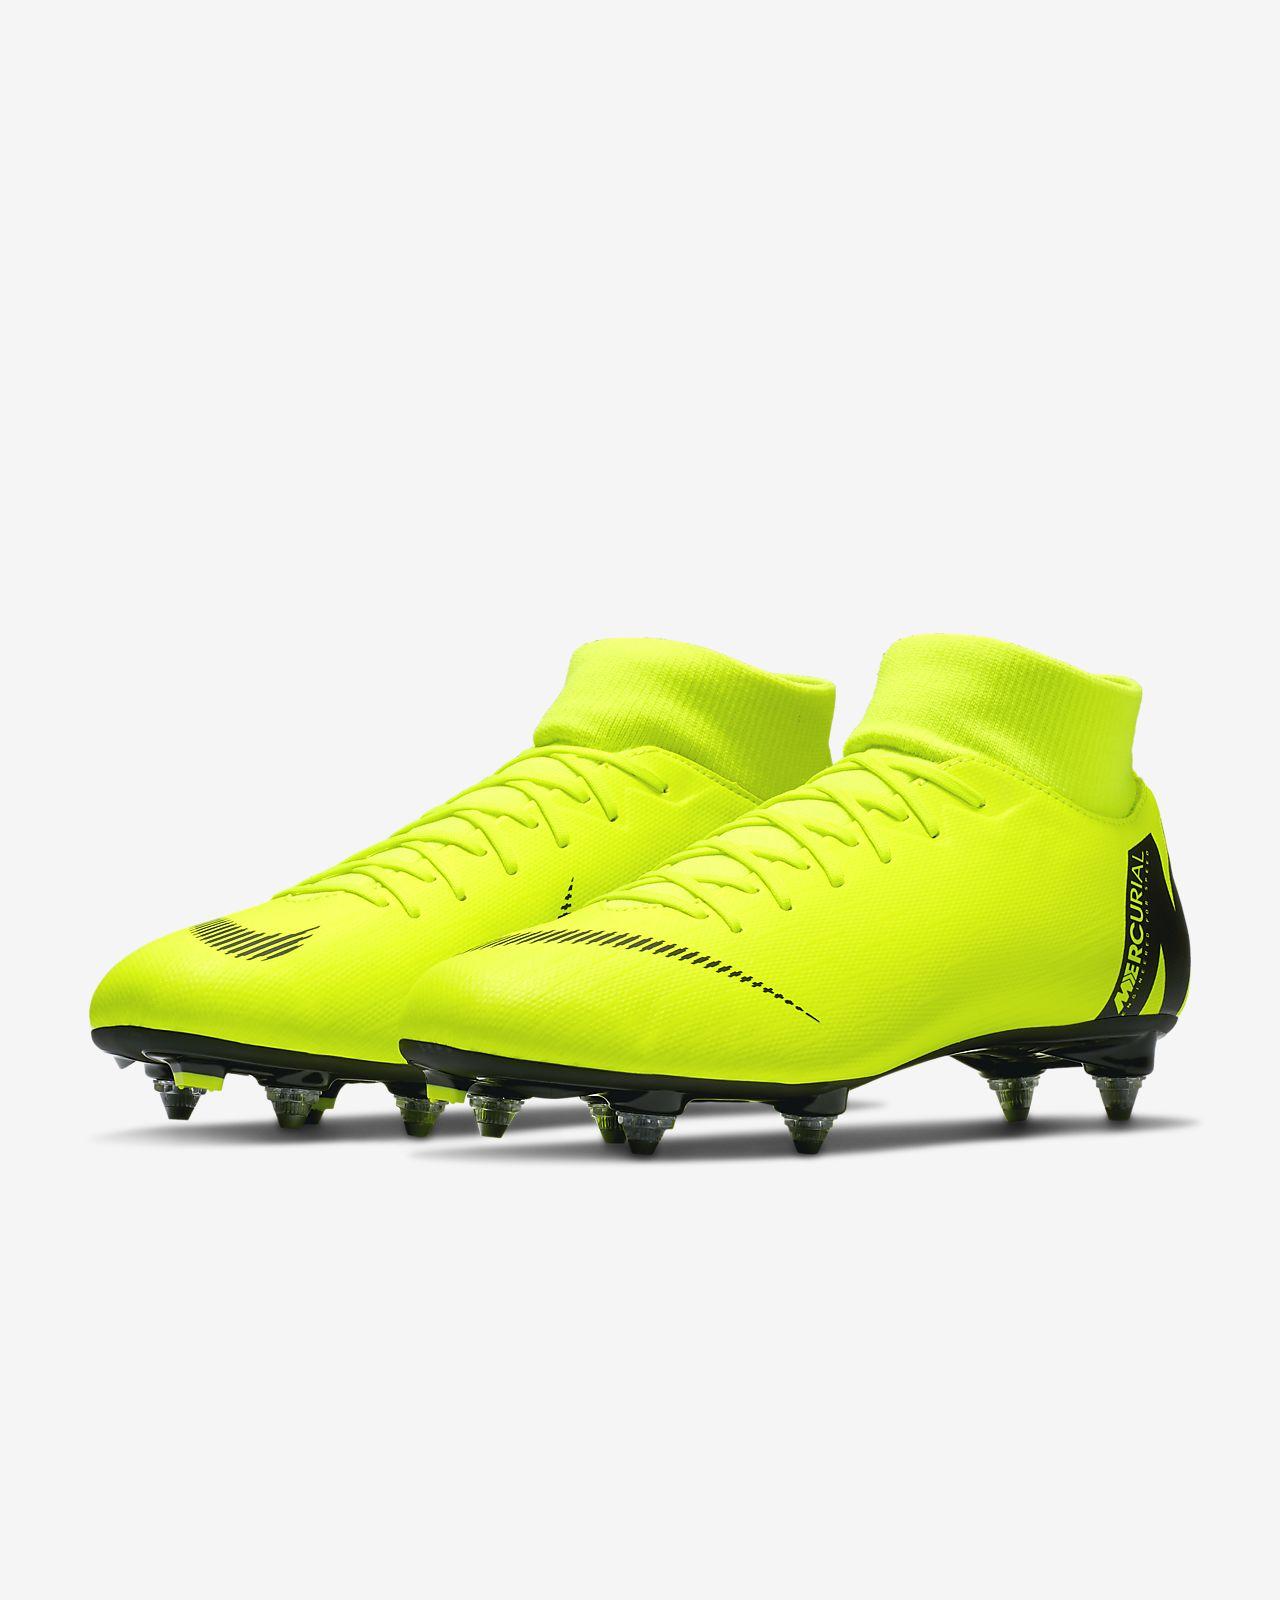 Nike Mercurial Superfly VI Academy SG-PRO Soft-Ground Football Boot ... 706e9277df